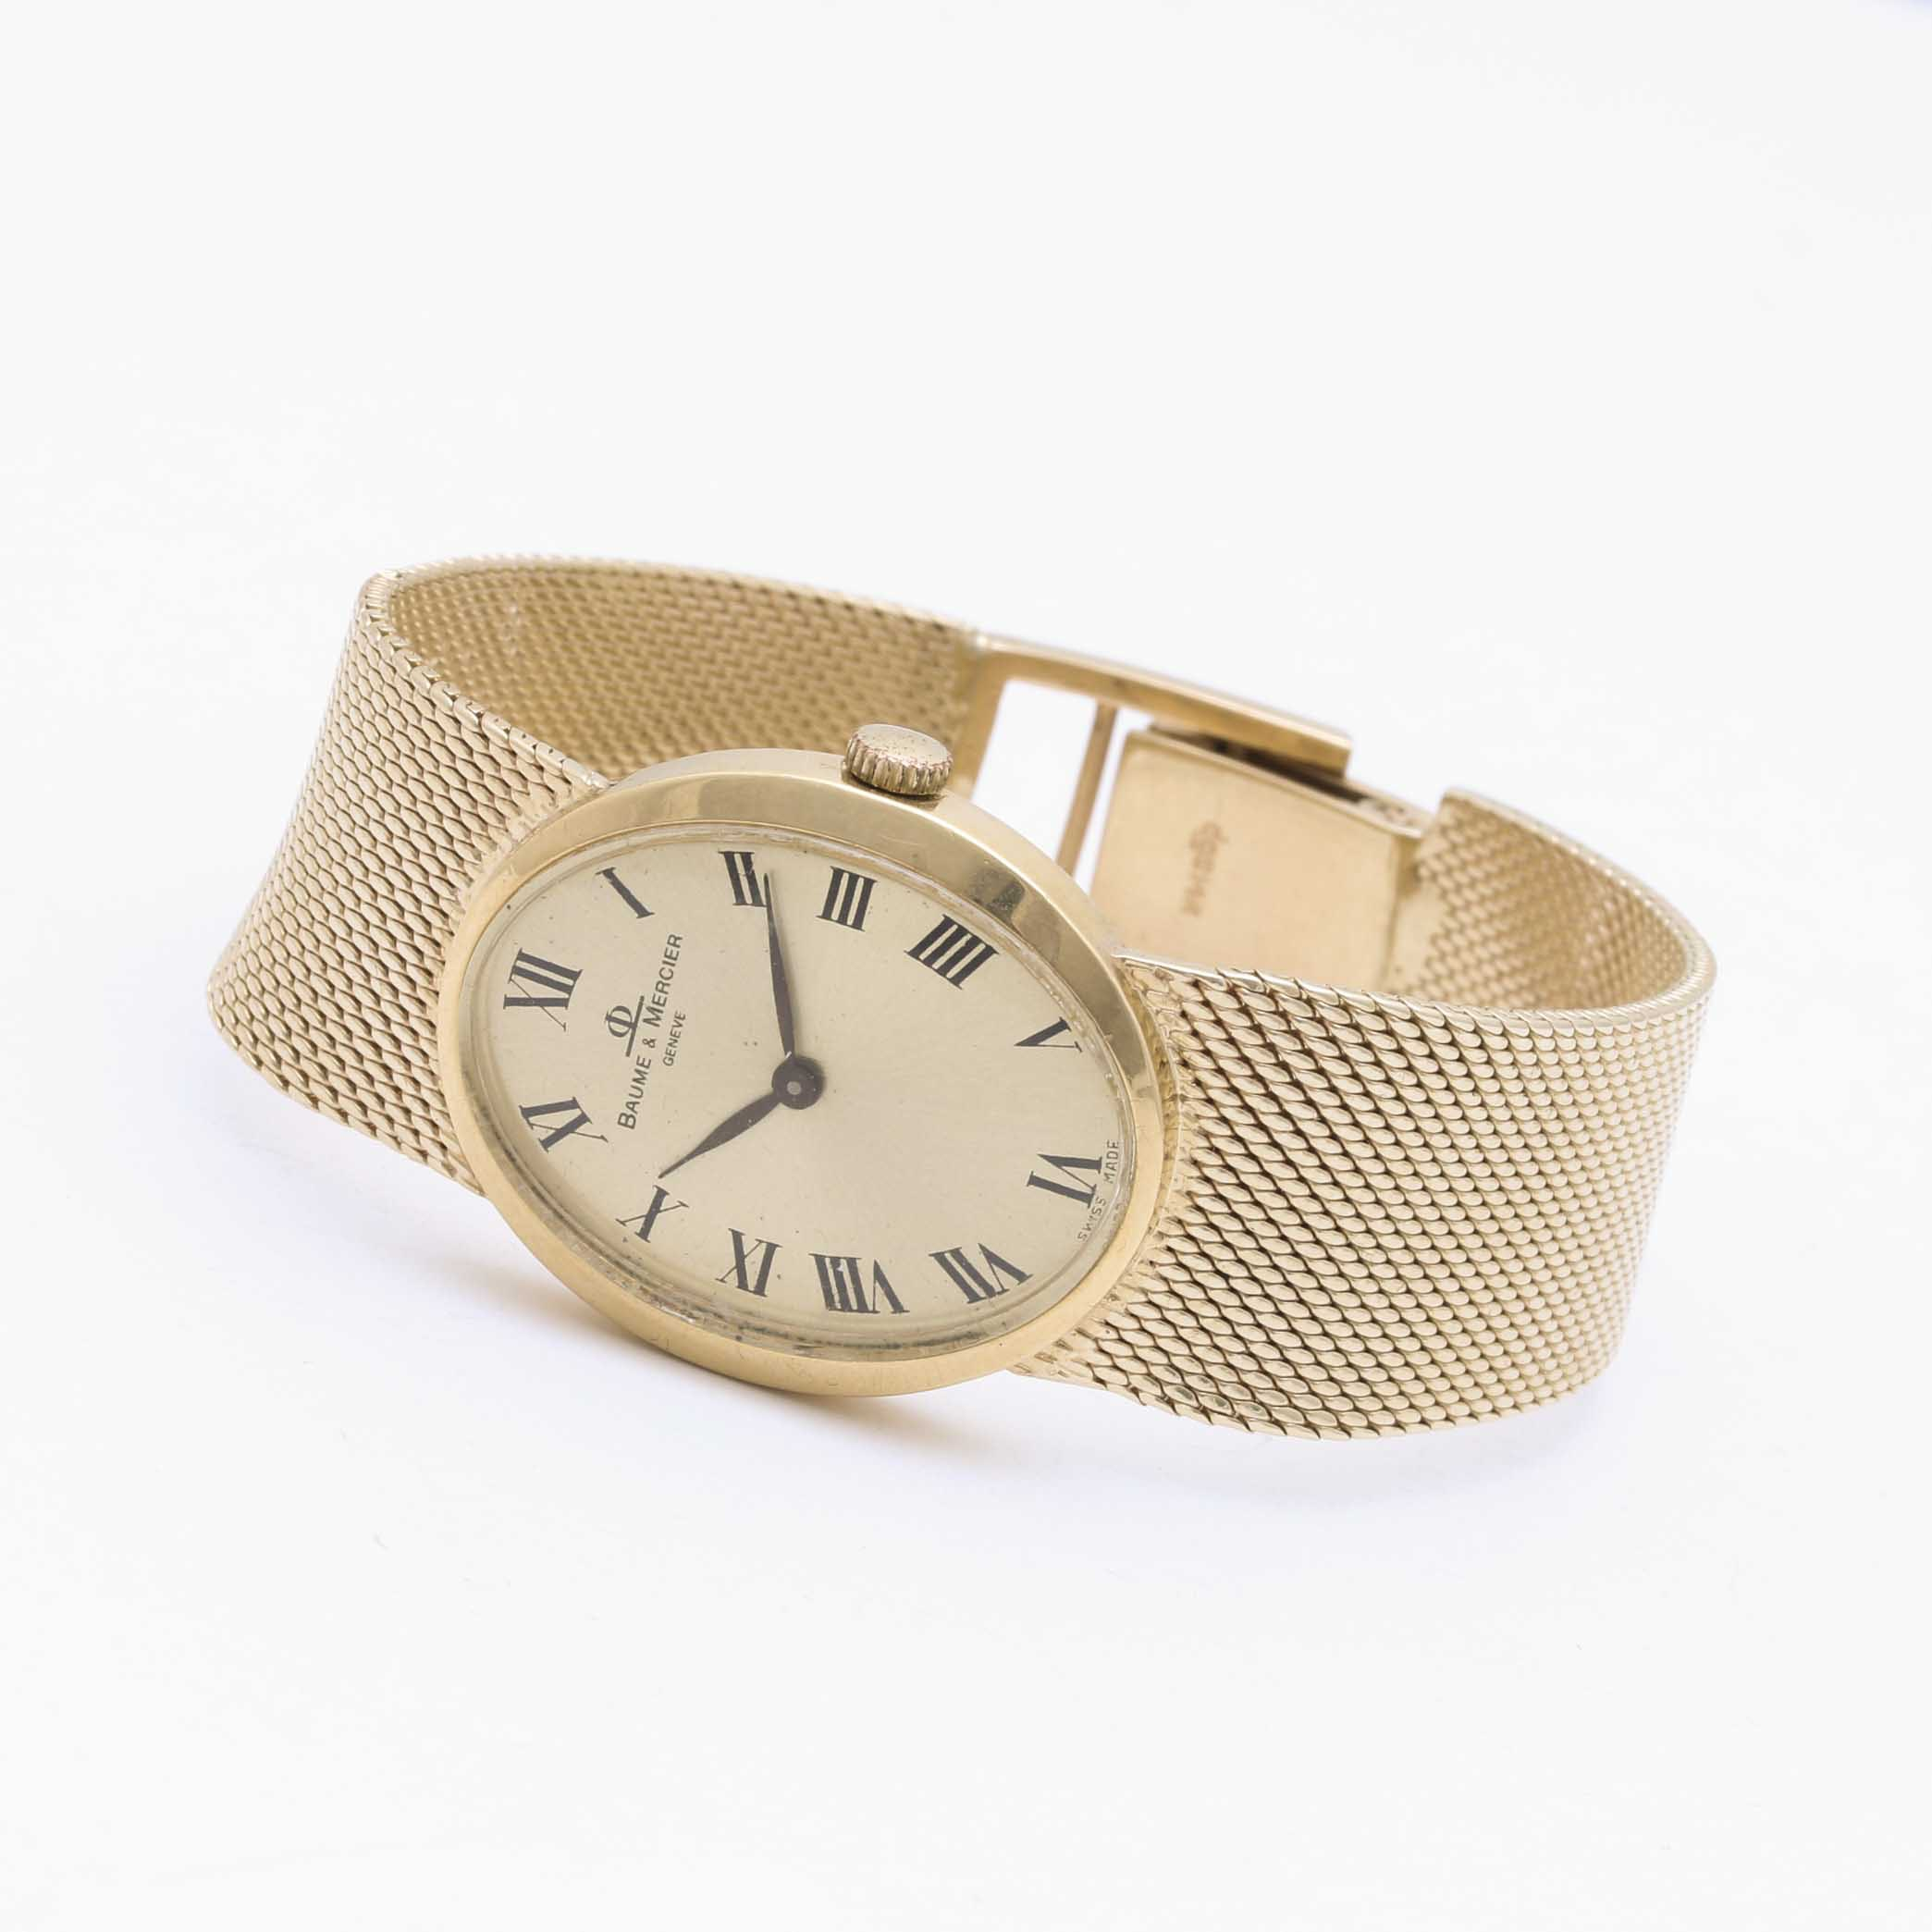 18K Yellow Gold Baume & Mercier Wristwatch